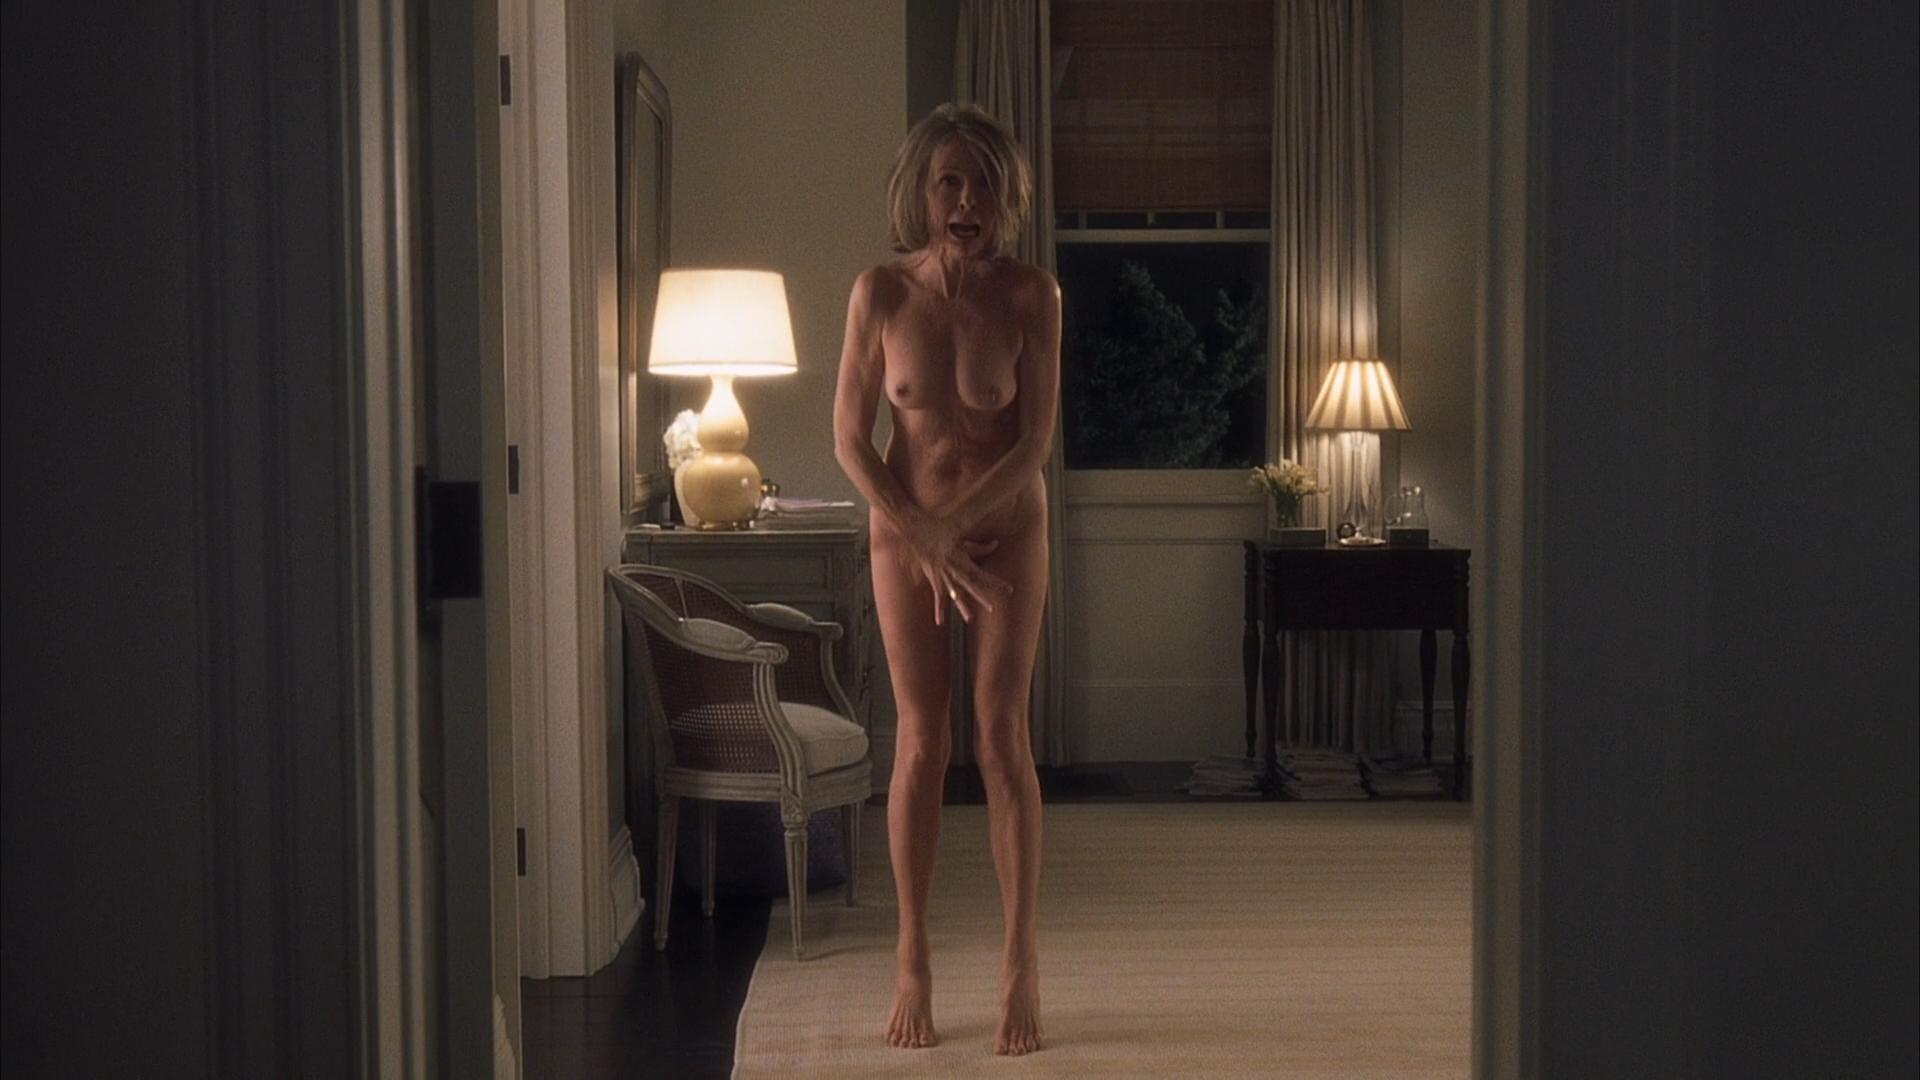 diane-keaton-naked-fakes-focking-nude-de-karisma-kapoor